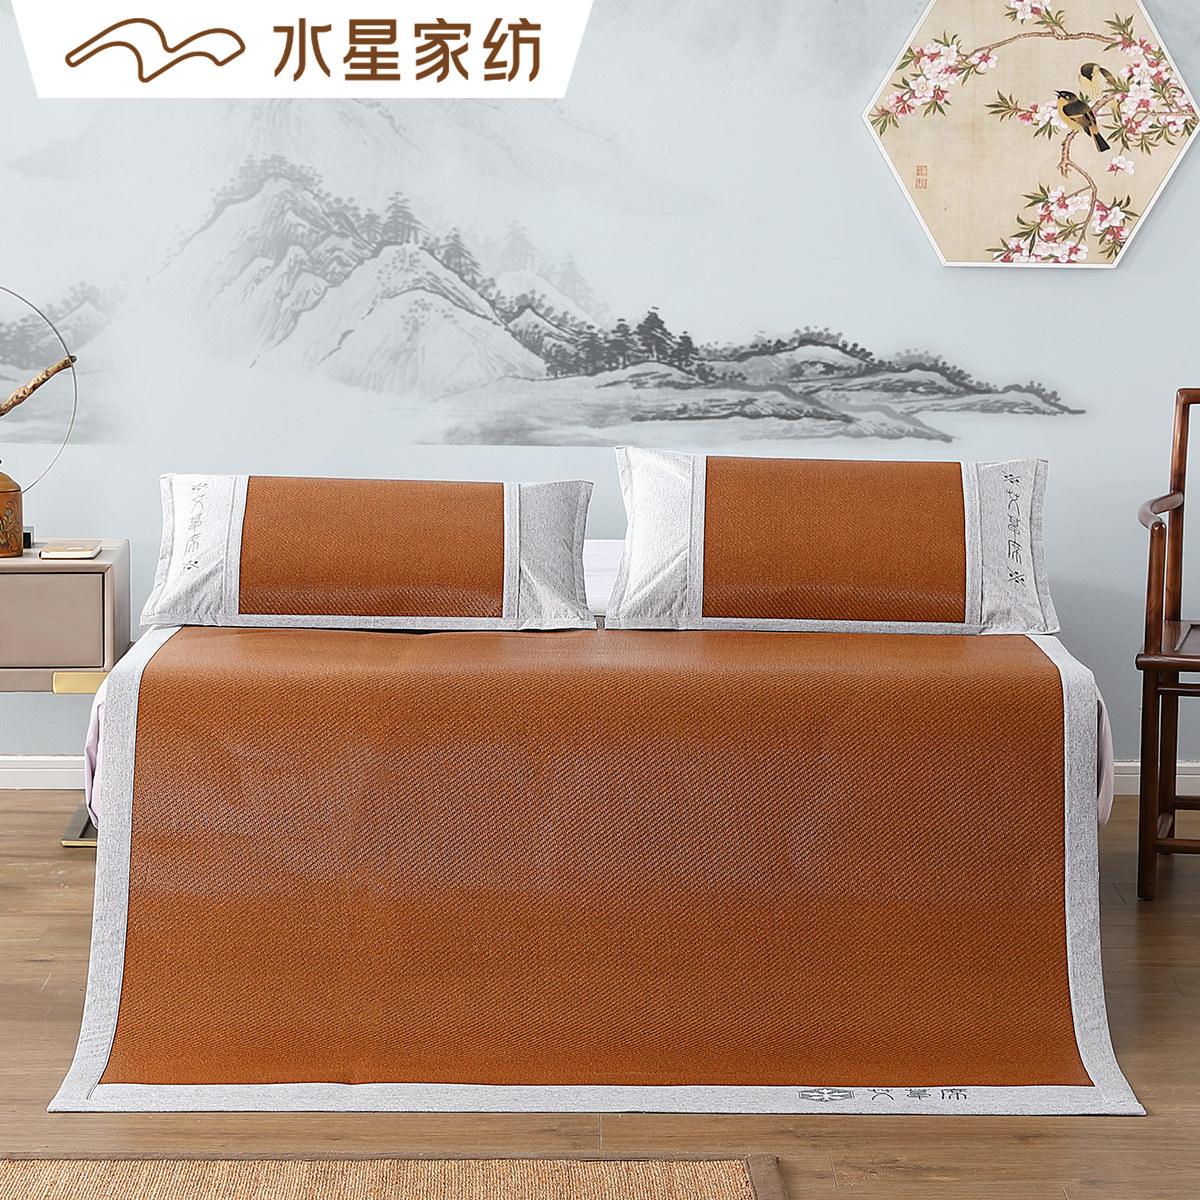 Декоративные одеяла и подушки / Прикроватные коврики Артикул 613055708509